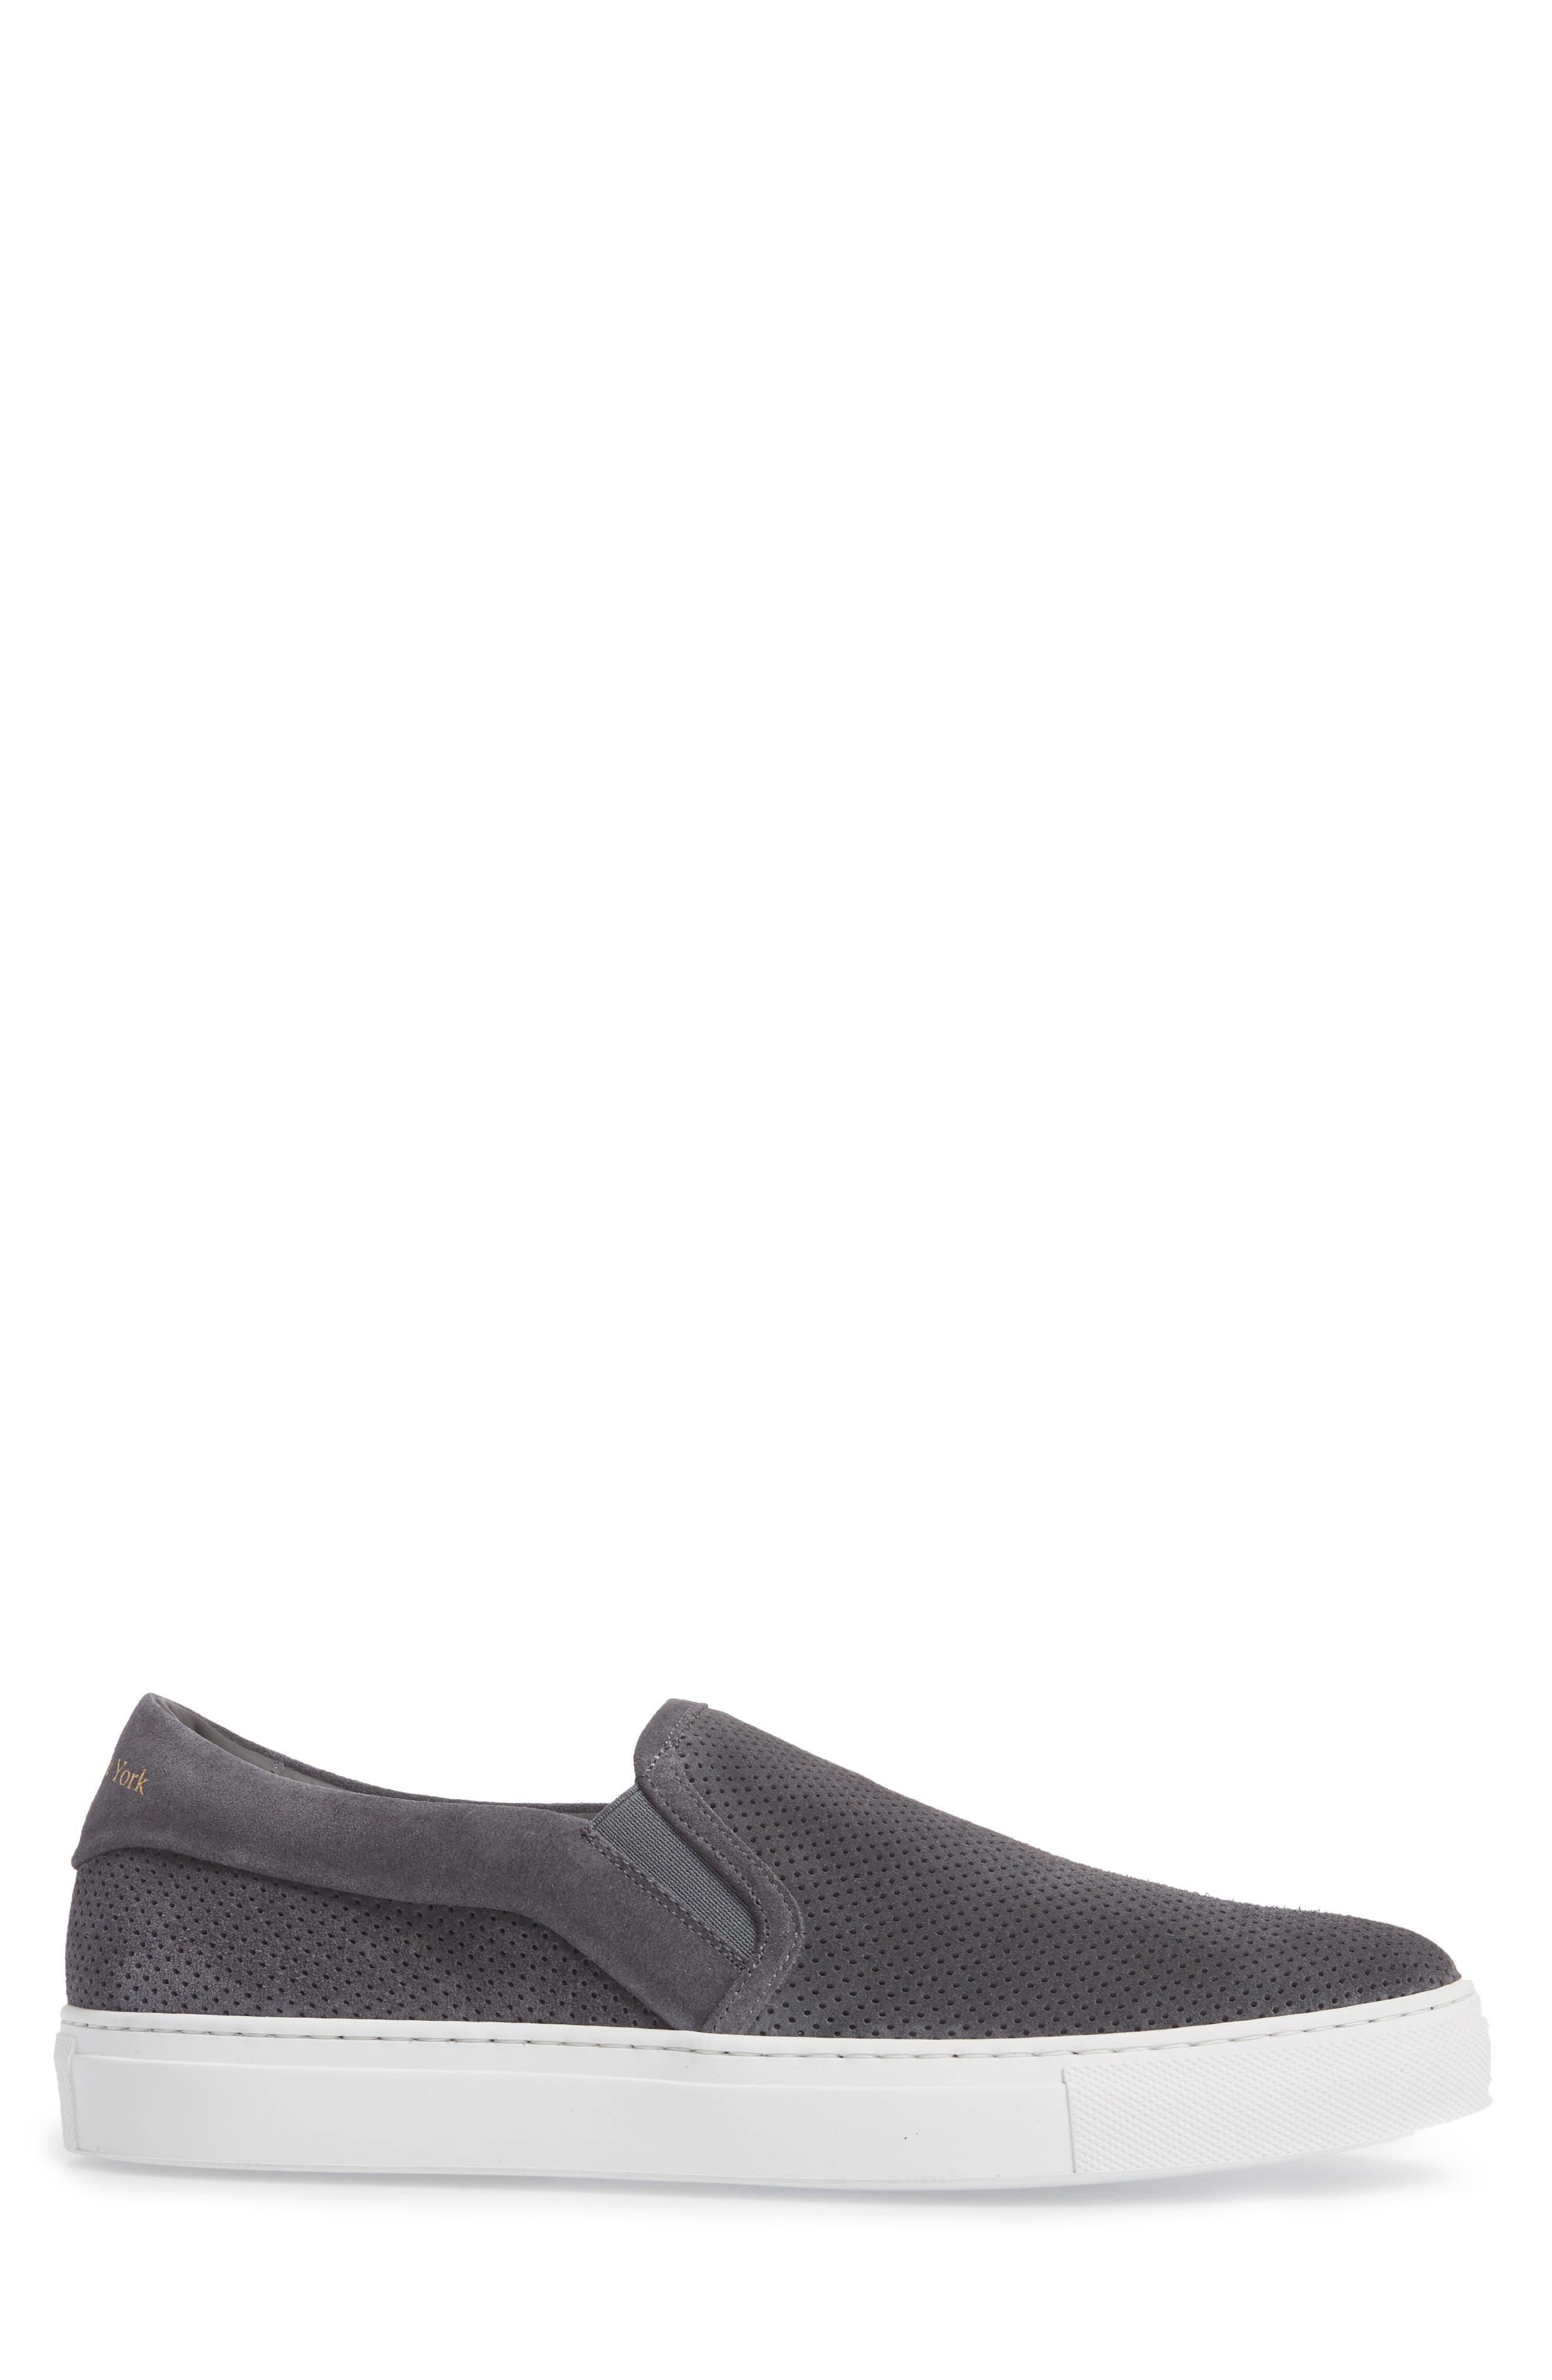 Buelton Perforated Slip-On Sneaker,                             Alternate thumbnail 3, color,                             Avion/ Tan Suede